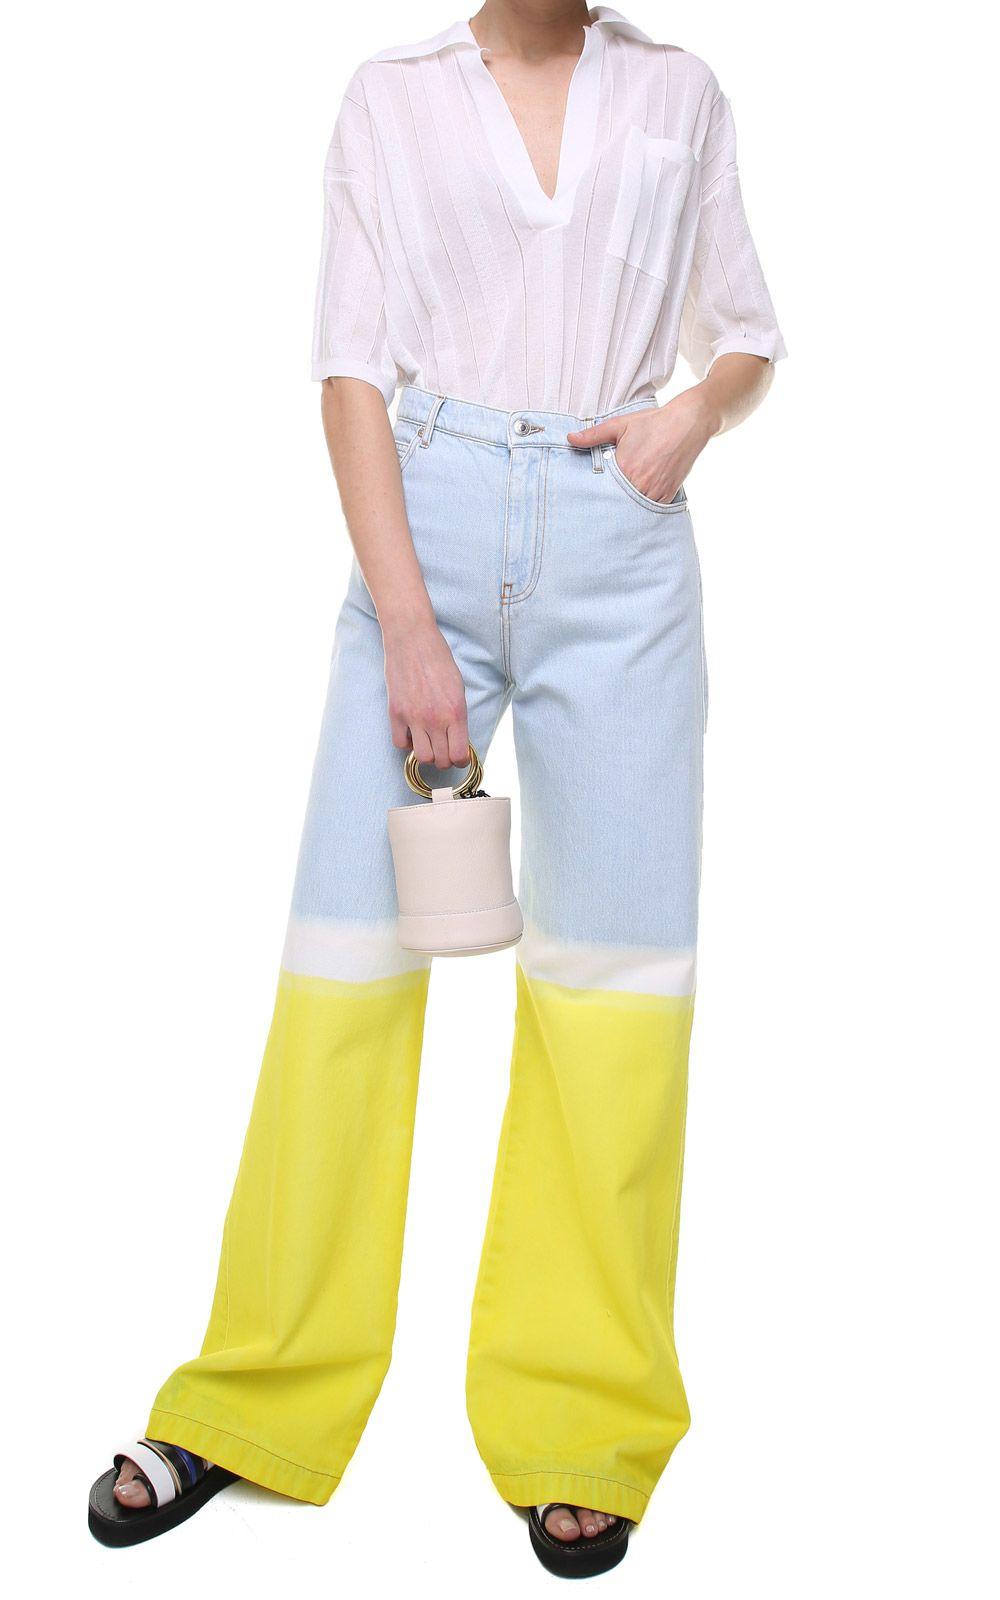 MSGM Tie-dye Cotton-denim Oversized Jeans 10535815